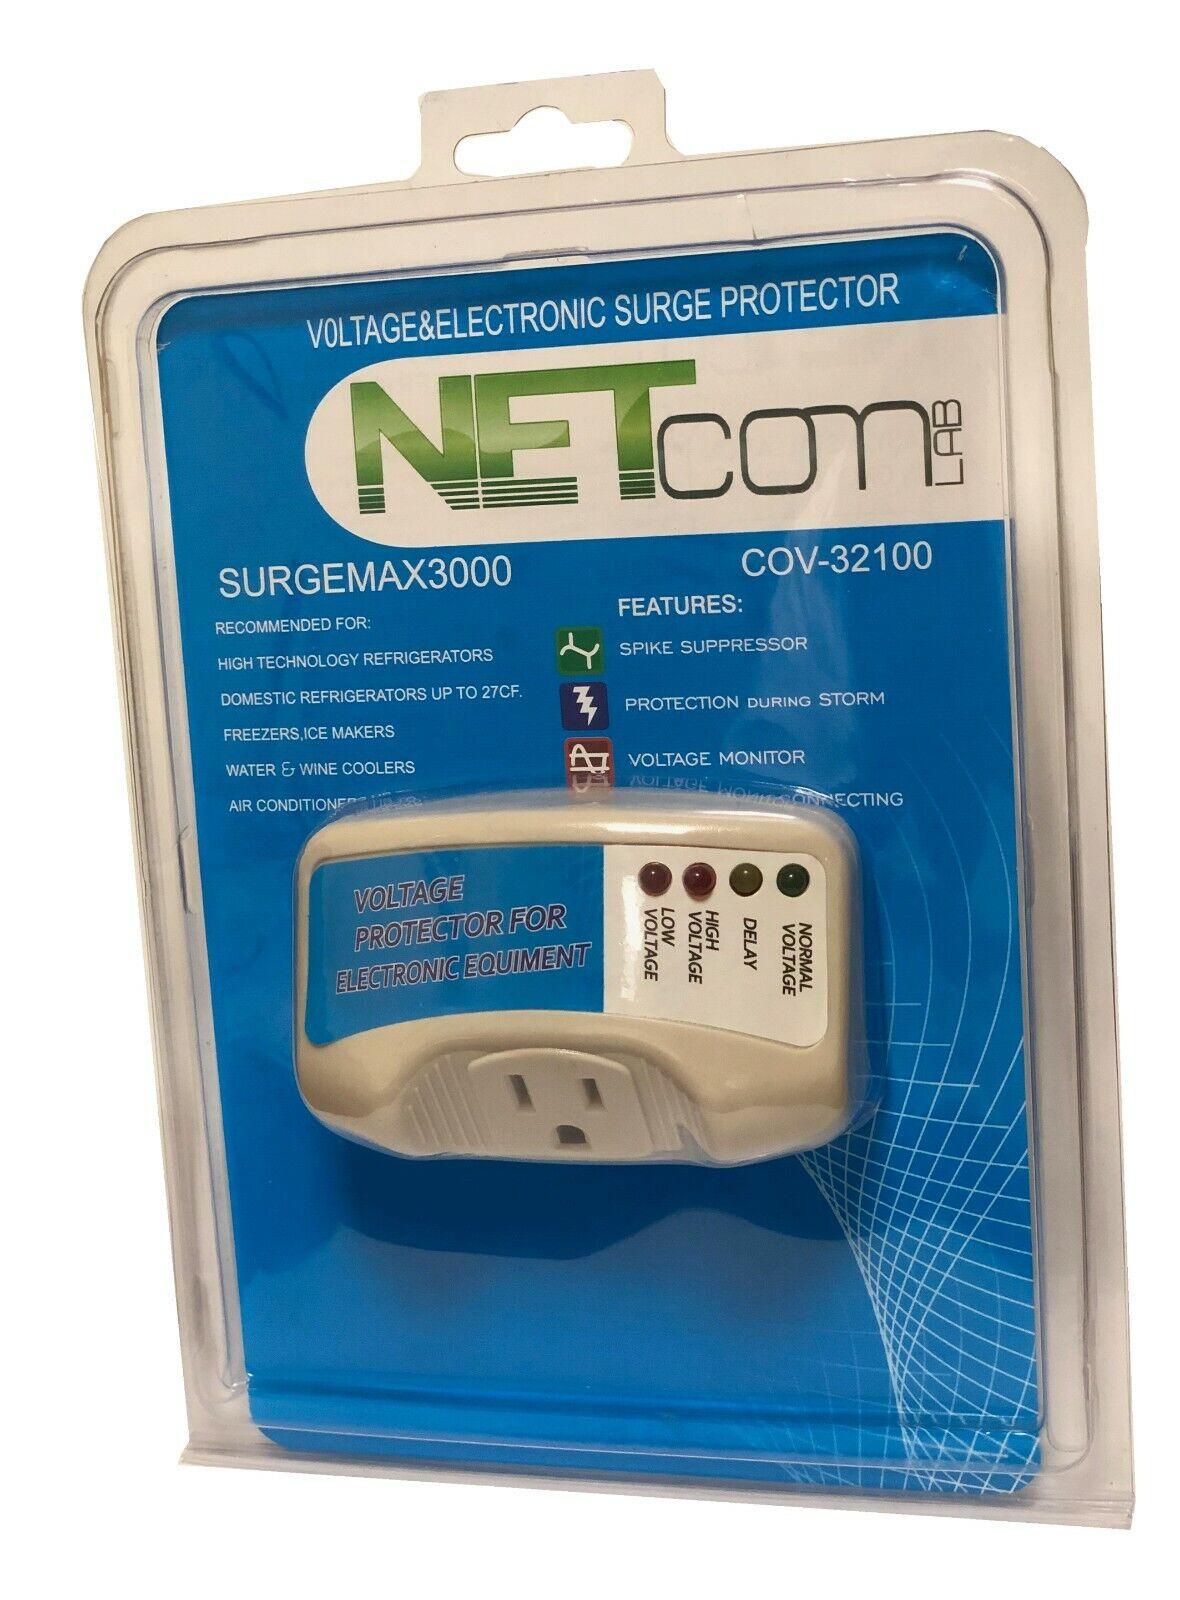 Surgemax3000 Surge Protector for Domestic Refrigerator & Air